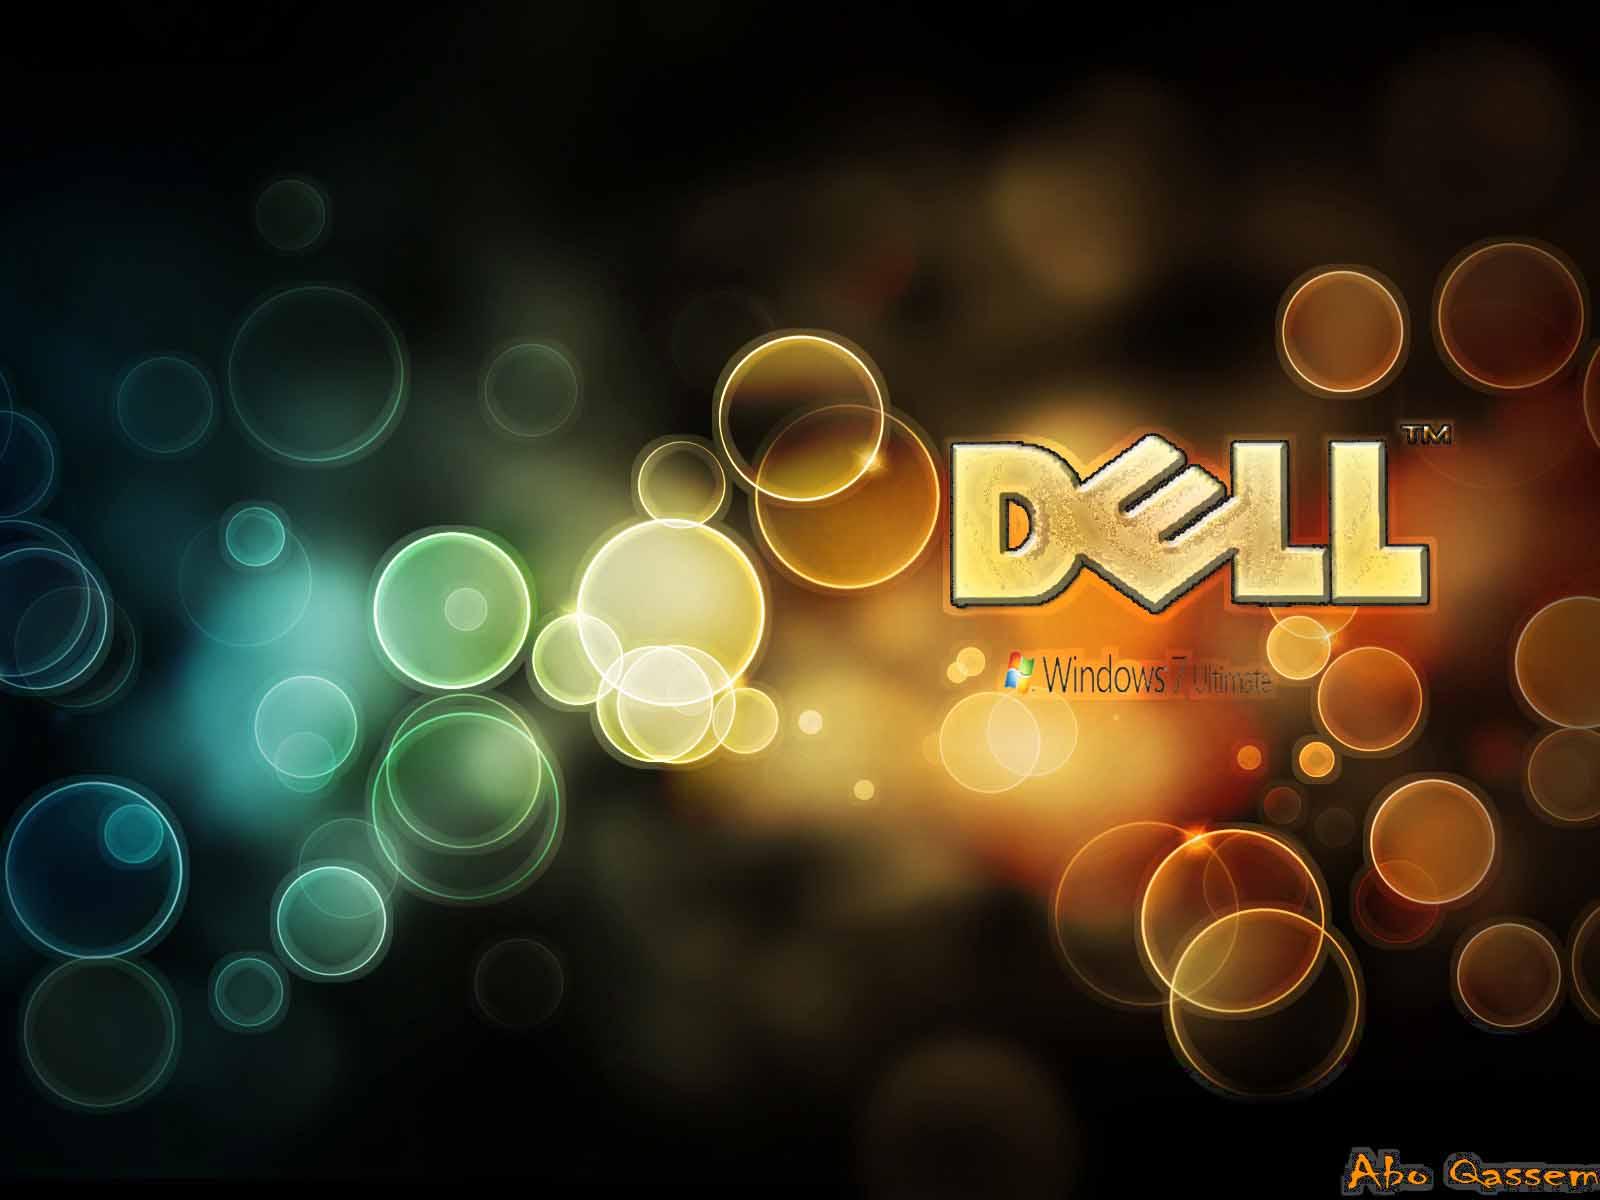 49 Free Dell Laptop Wallpaper Downloads On Wallpapersafari